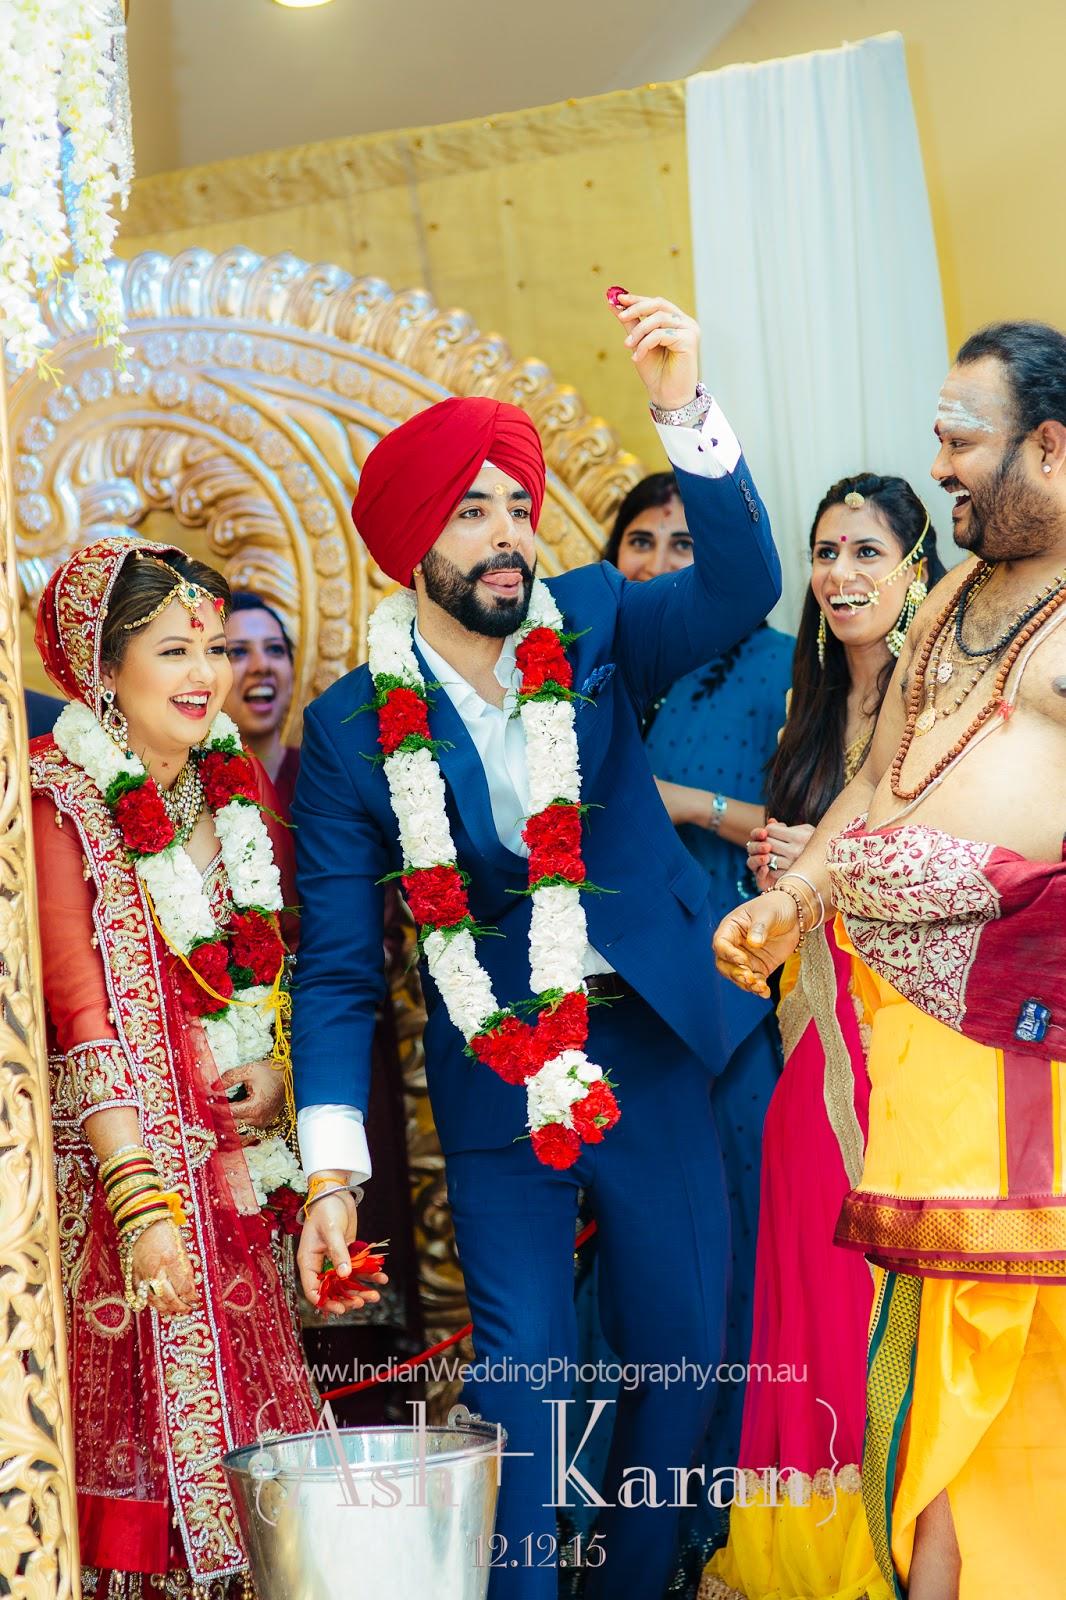 Wedding%2BCeremony%2B %2BAsh%2Band%2BKaran%2527s%2BWedding 136 - Wedding Ceremony Meaning